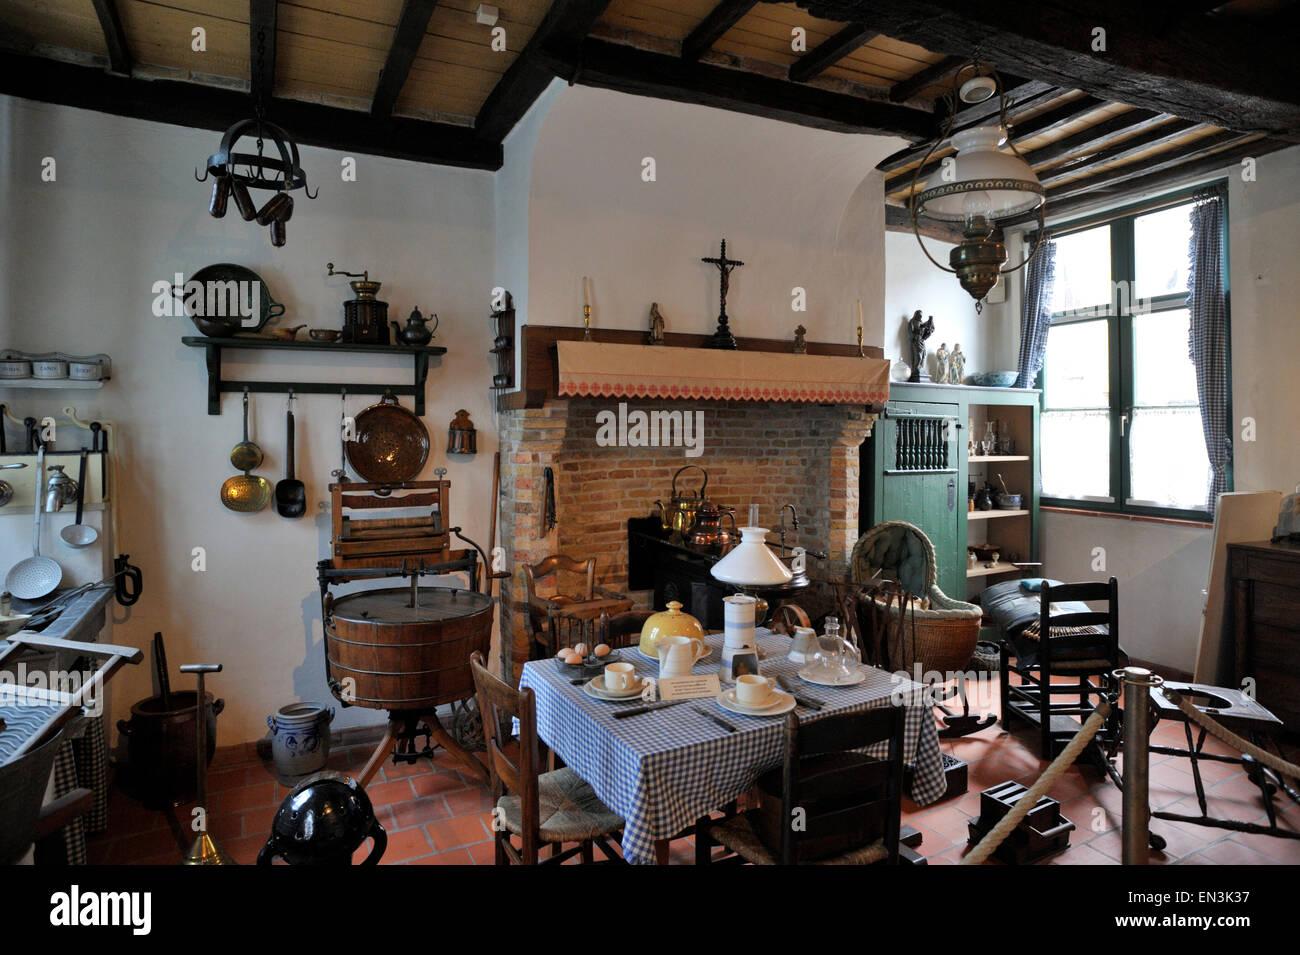 Belgio, bruges, museo del folclore volkskunde Immagini Stock